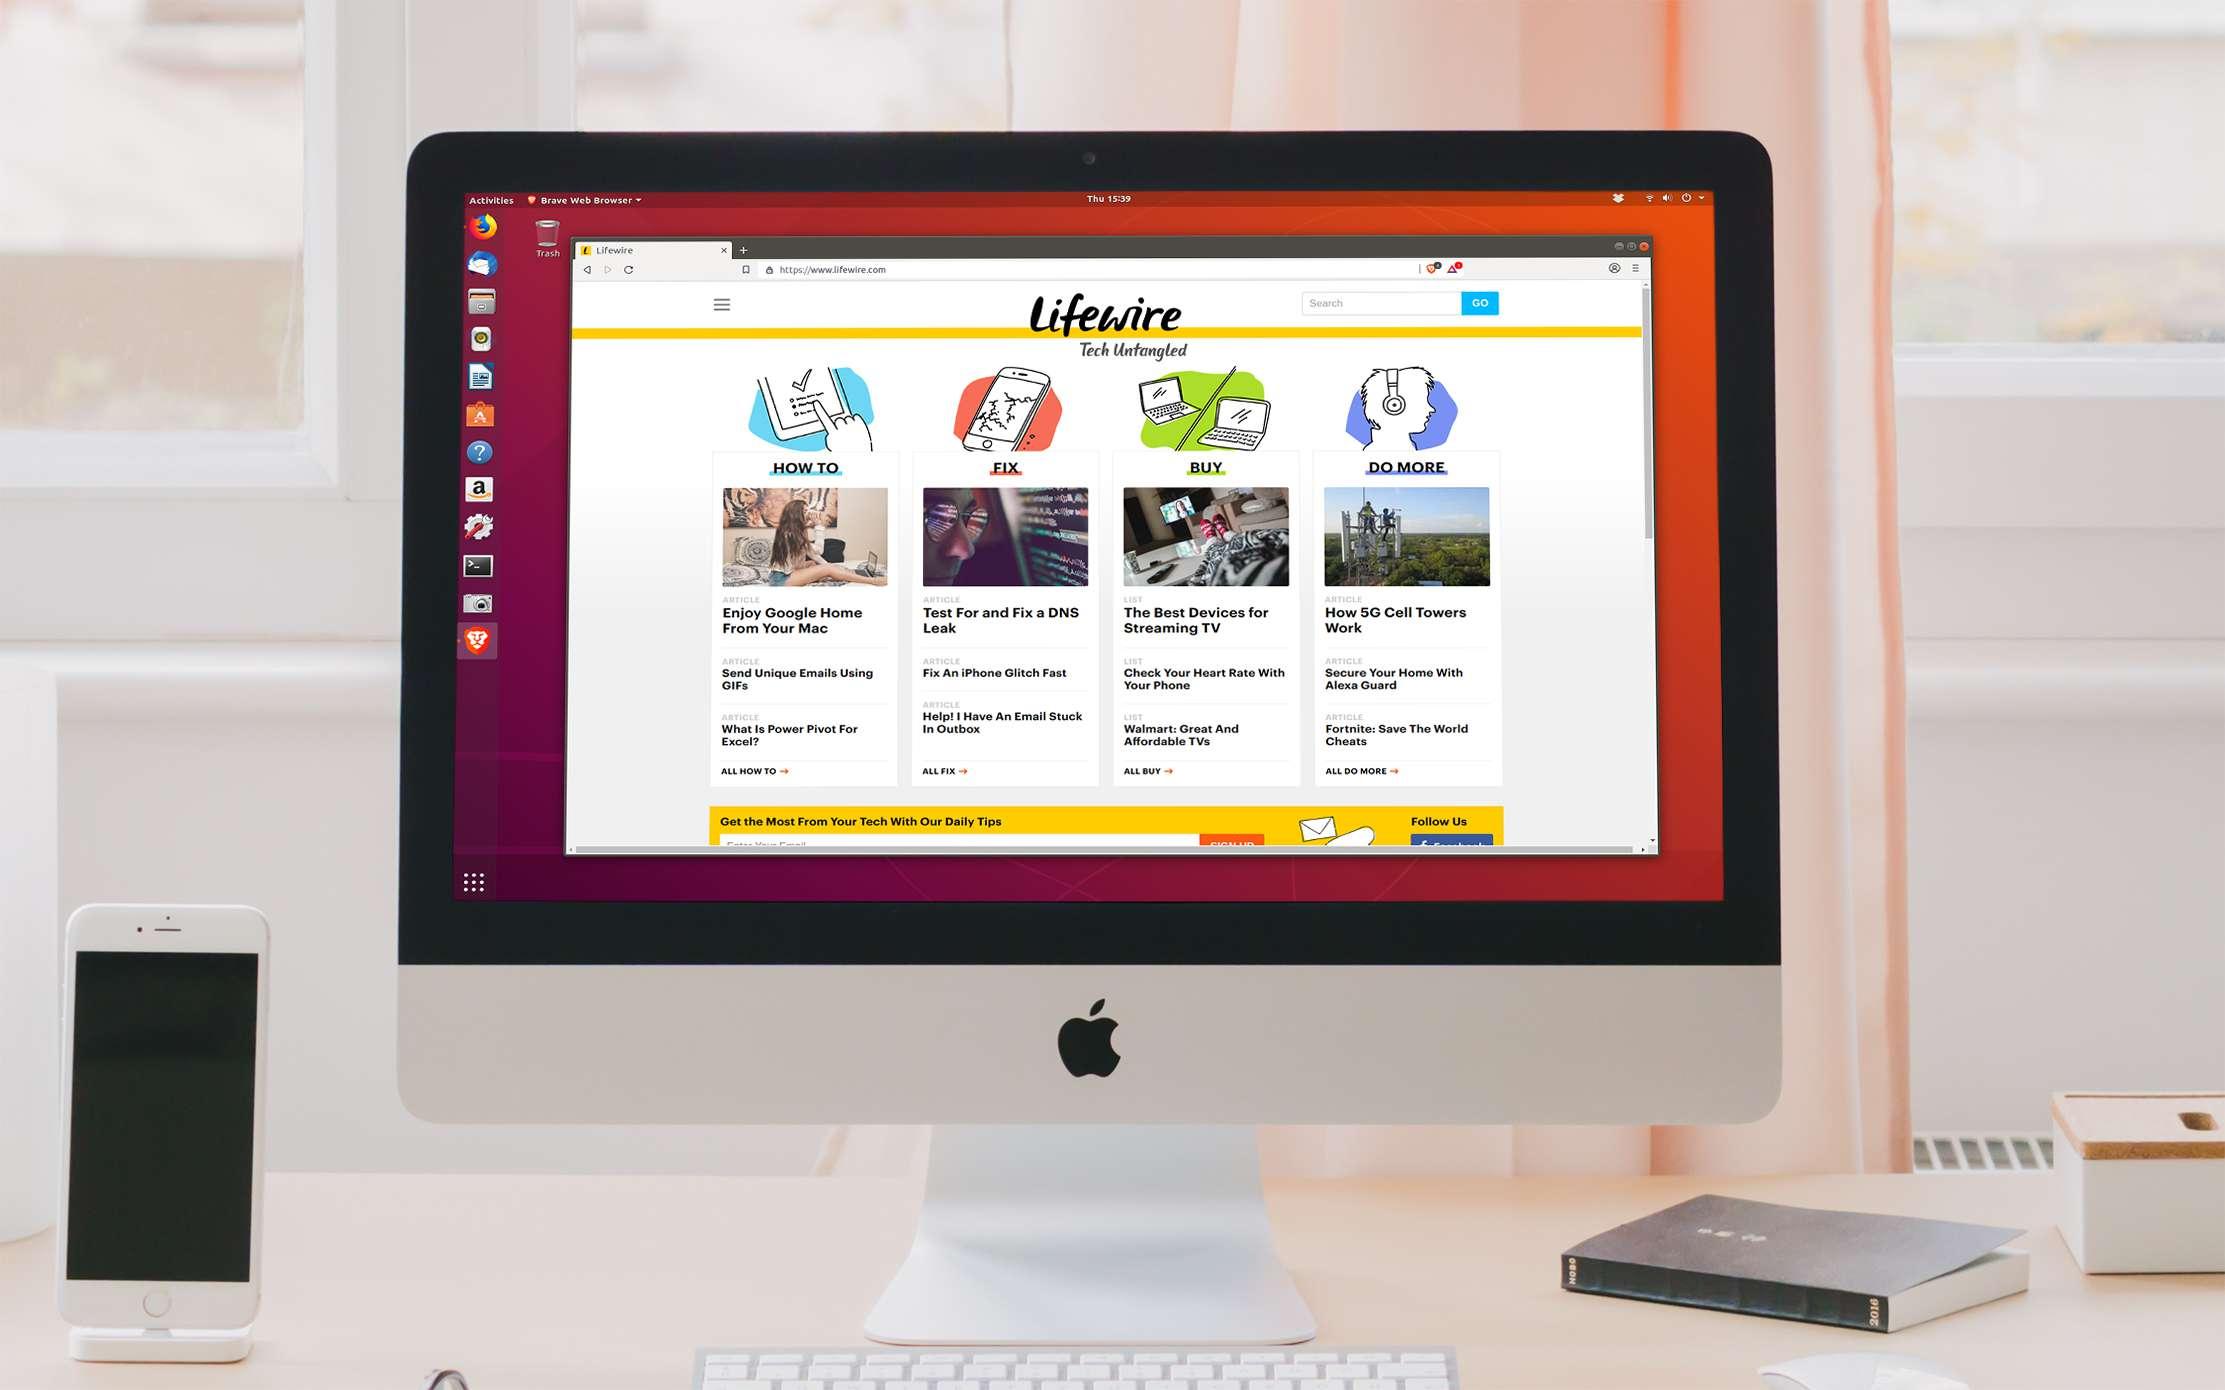 Brave Web Browser on Ubuntu Linux on an iMac computer